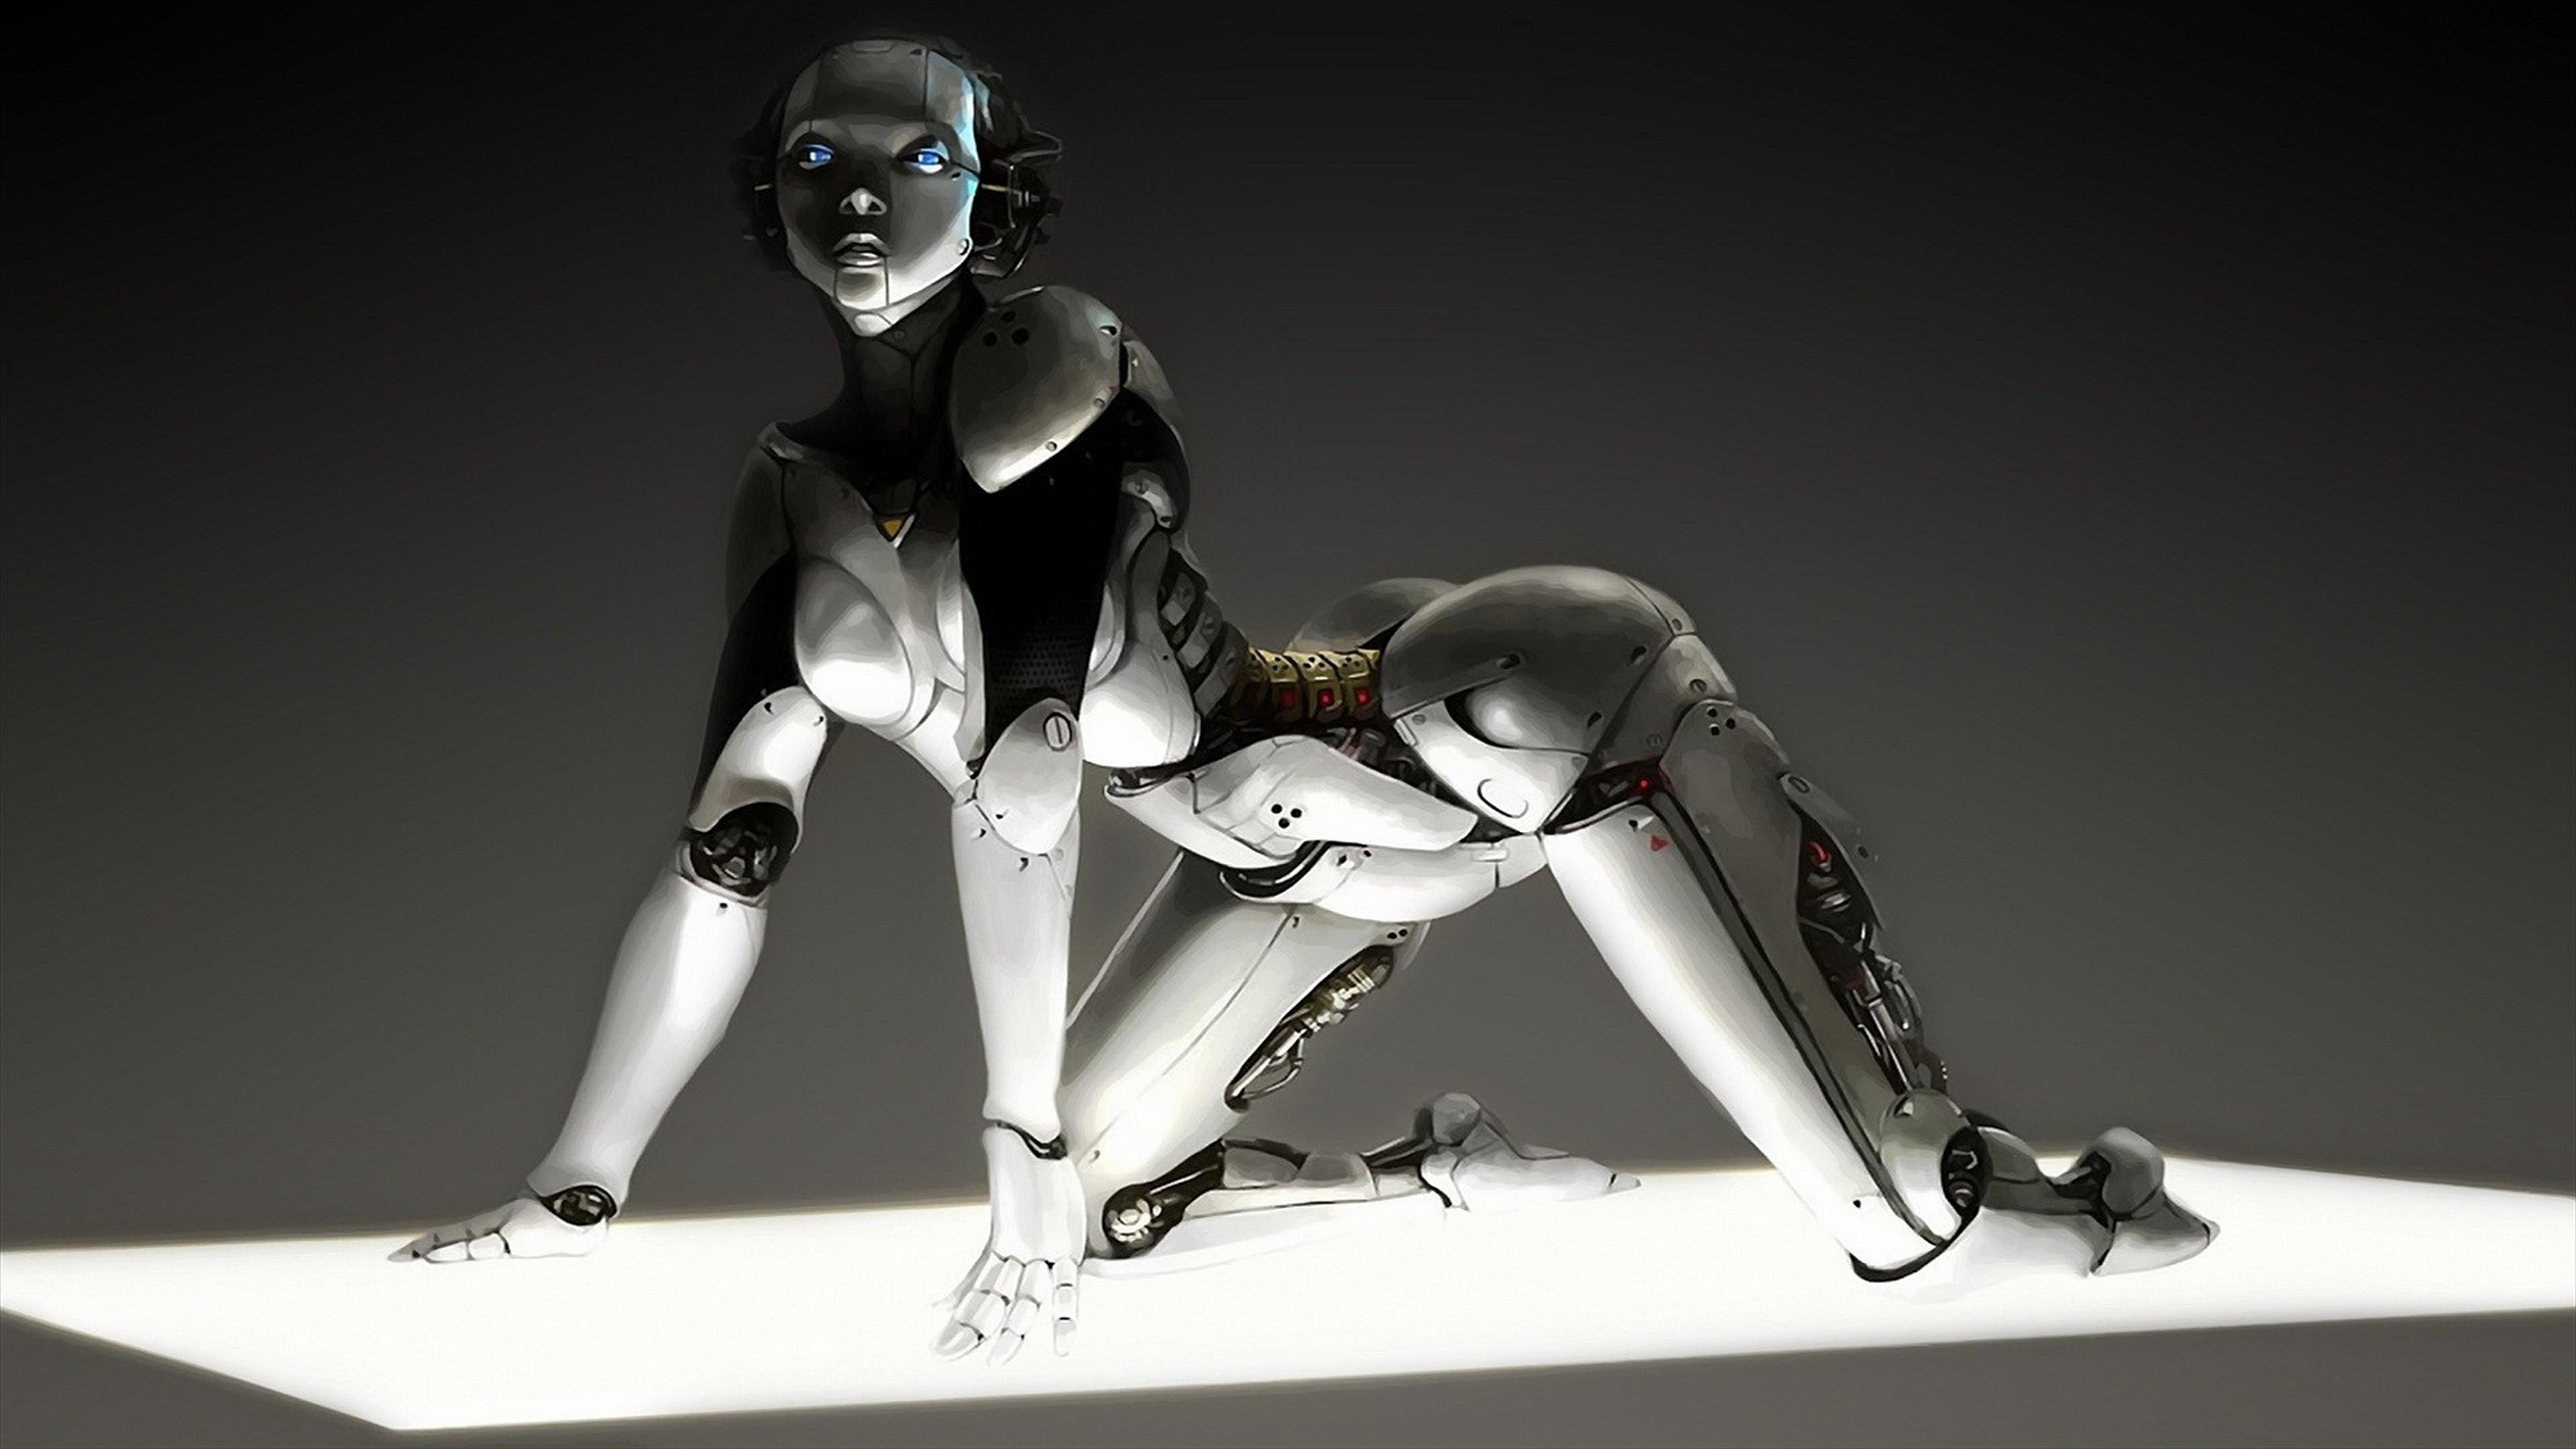 Elf girl spanked art naked picture